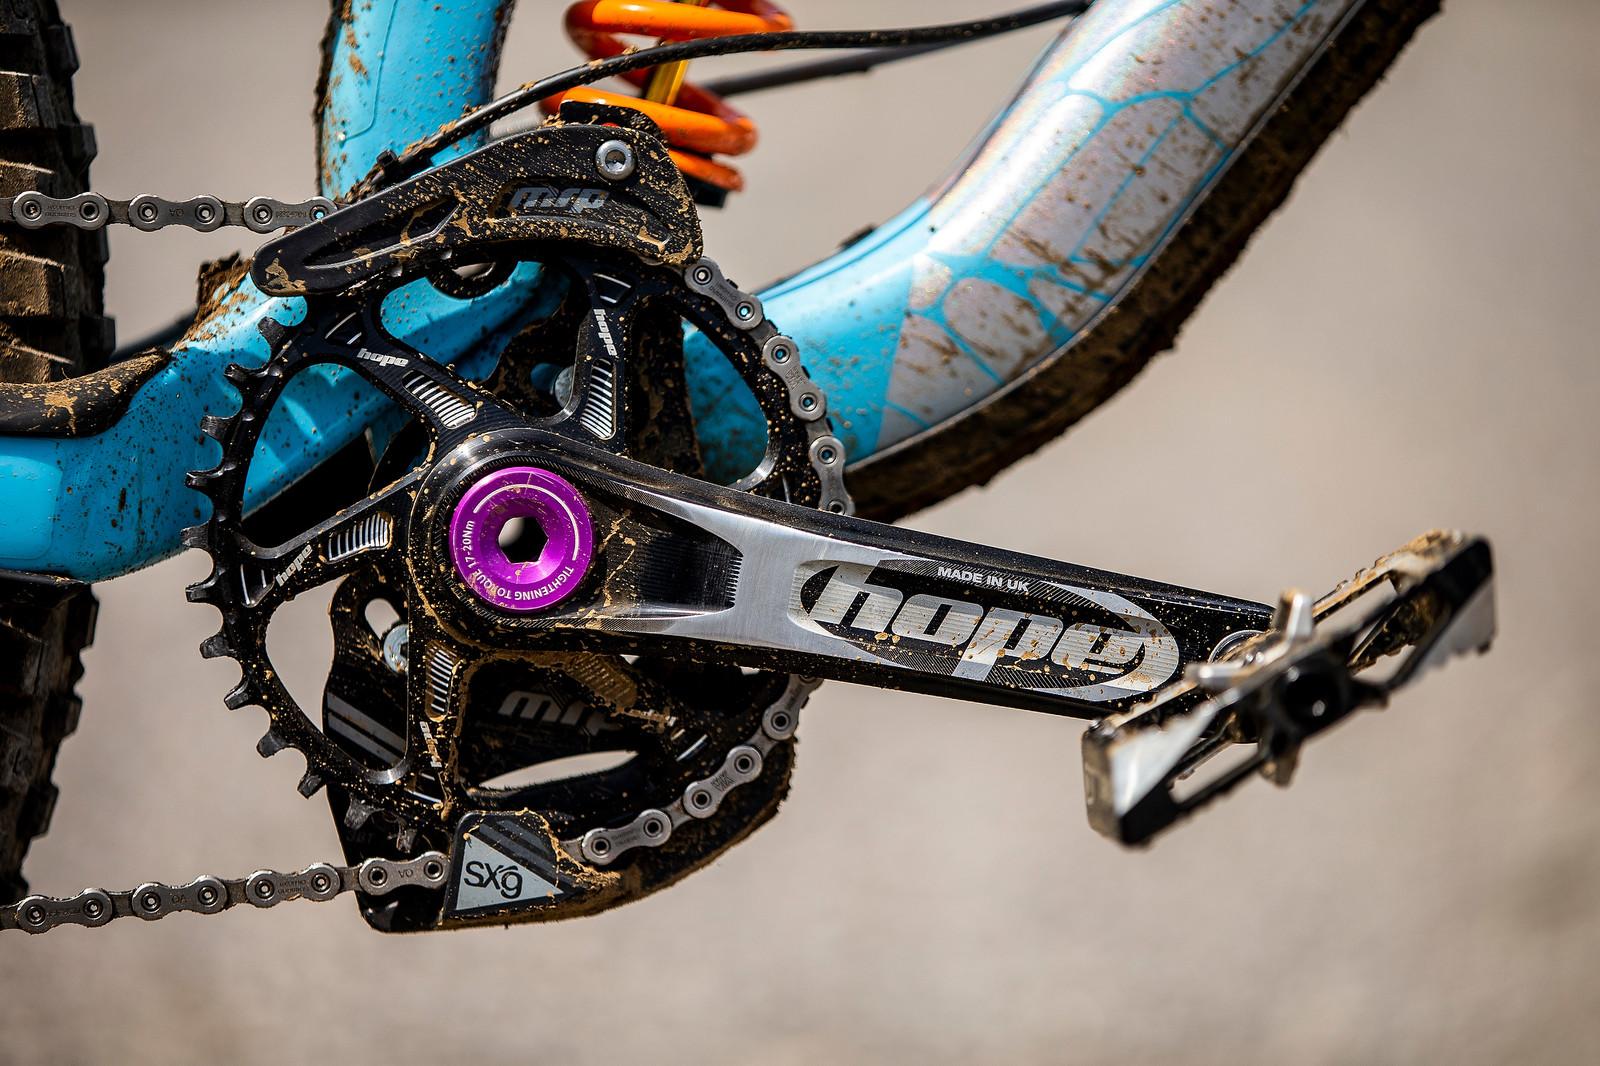 MSA18  H1D0954 - MSA 2018 Winning Bike: Rachel Atherton's Trek Session - Mountain Biking Pictures - Vital MTB